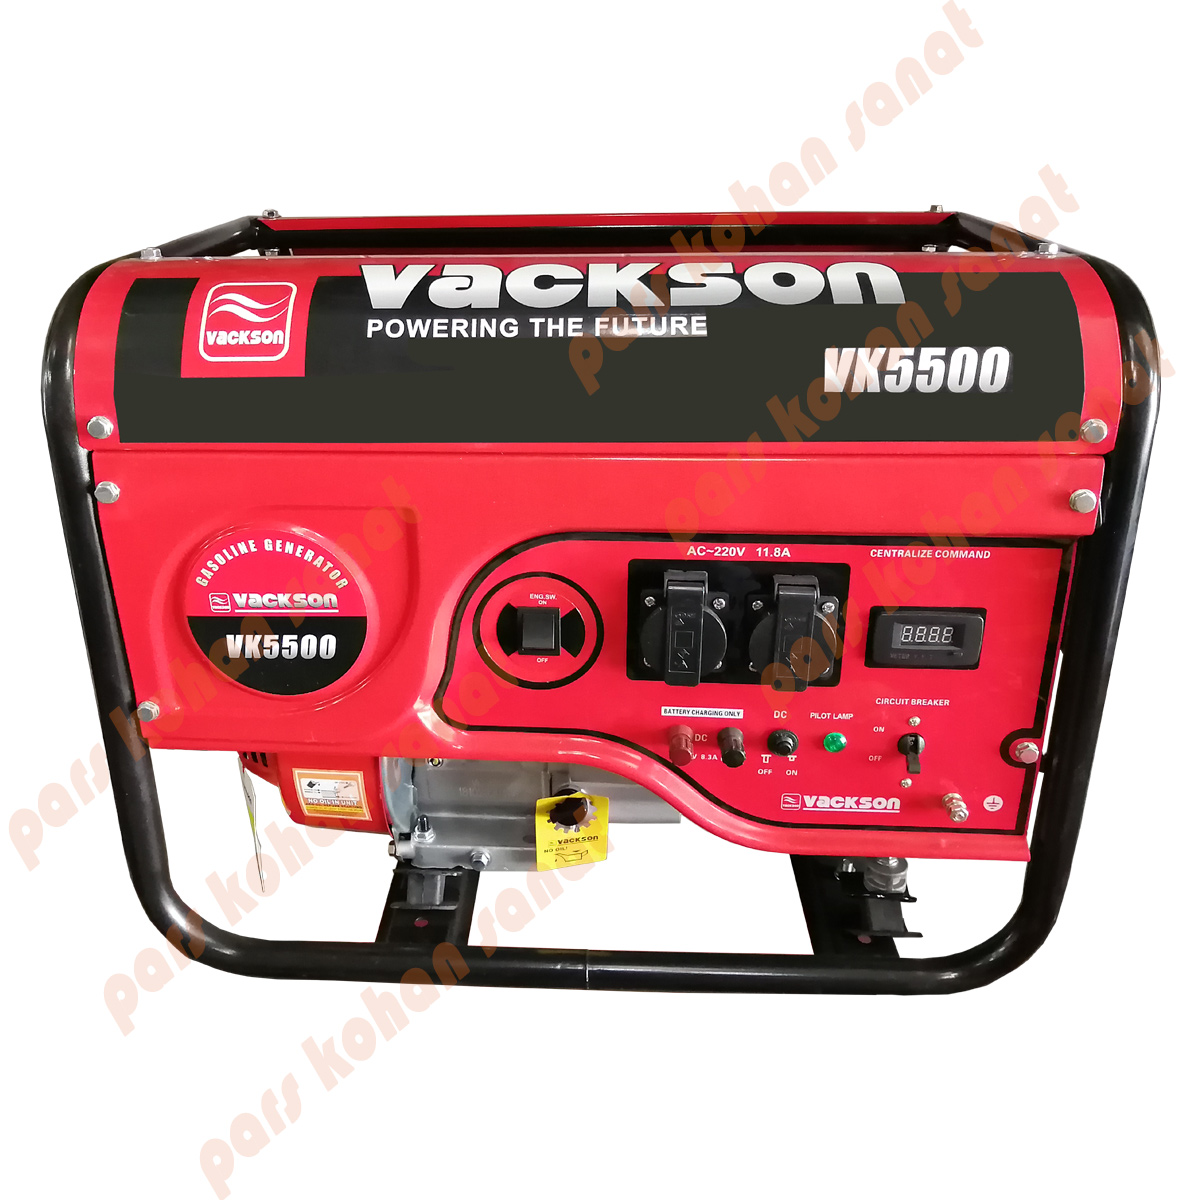 موتور برق وکسون مدل VK5500